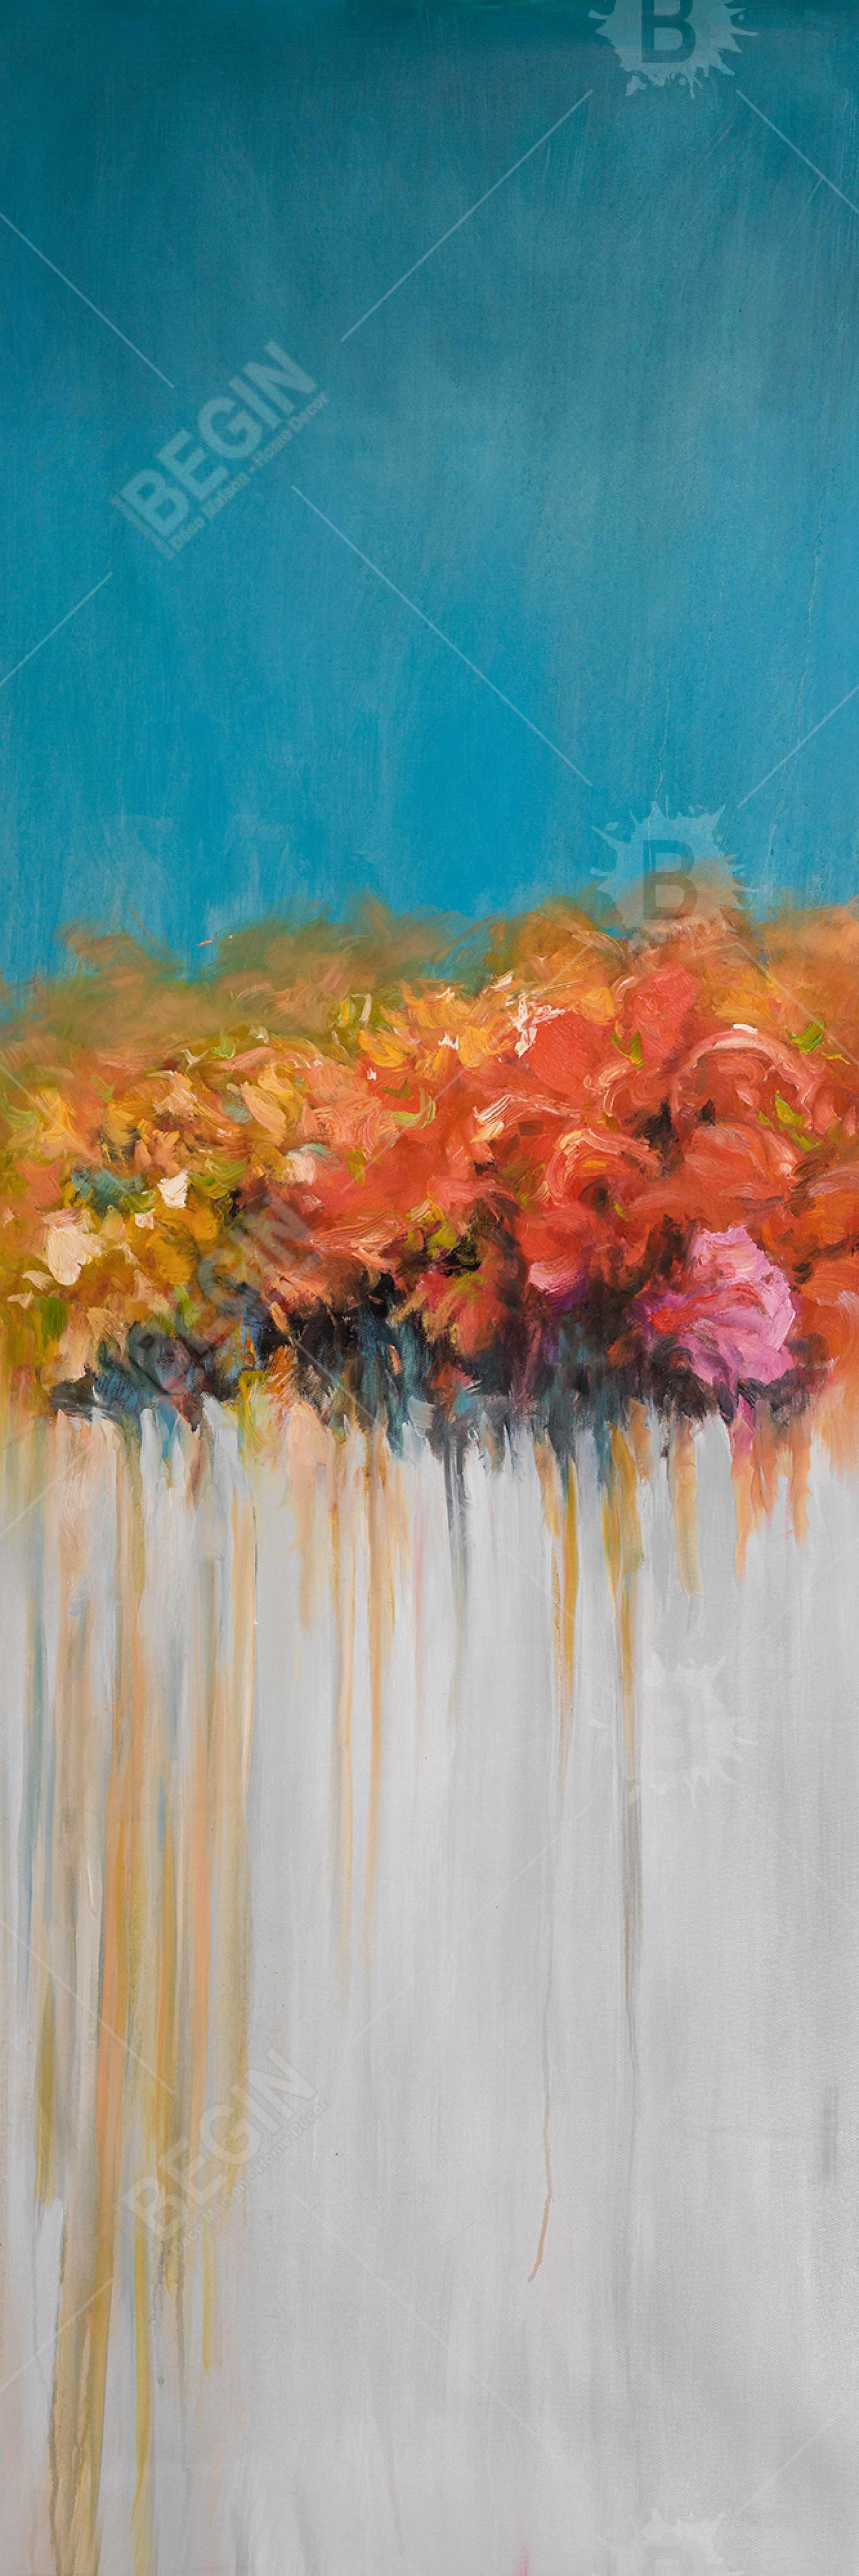 Orange flowers bundle